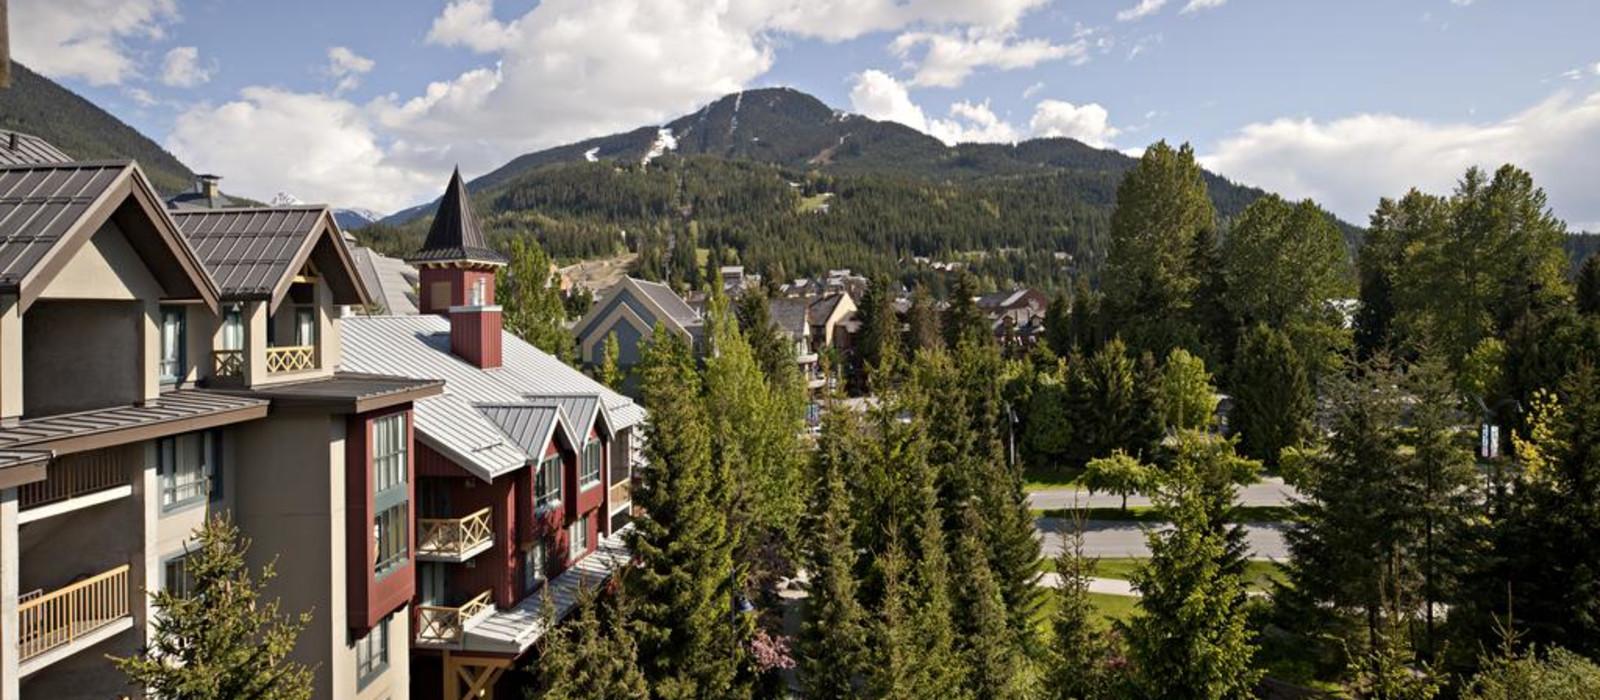 Hotel Delta s by Marriott Whistler Village Suites Canada